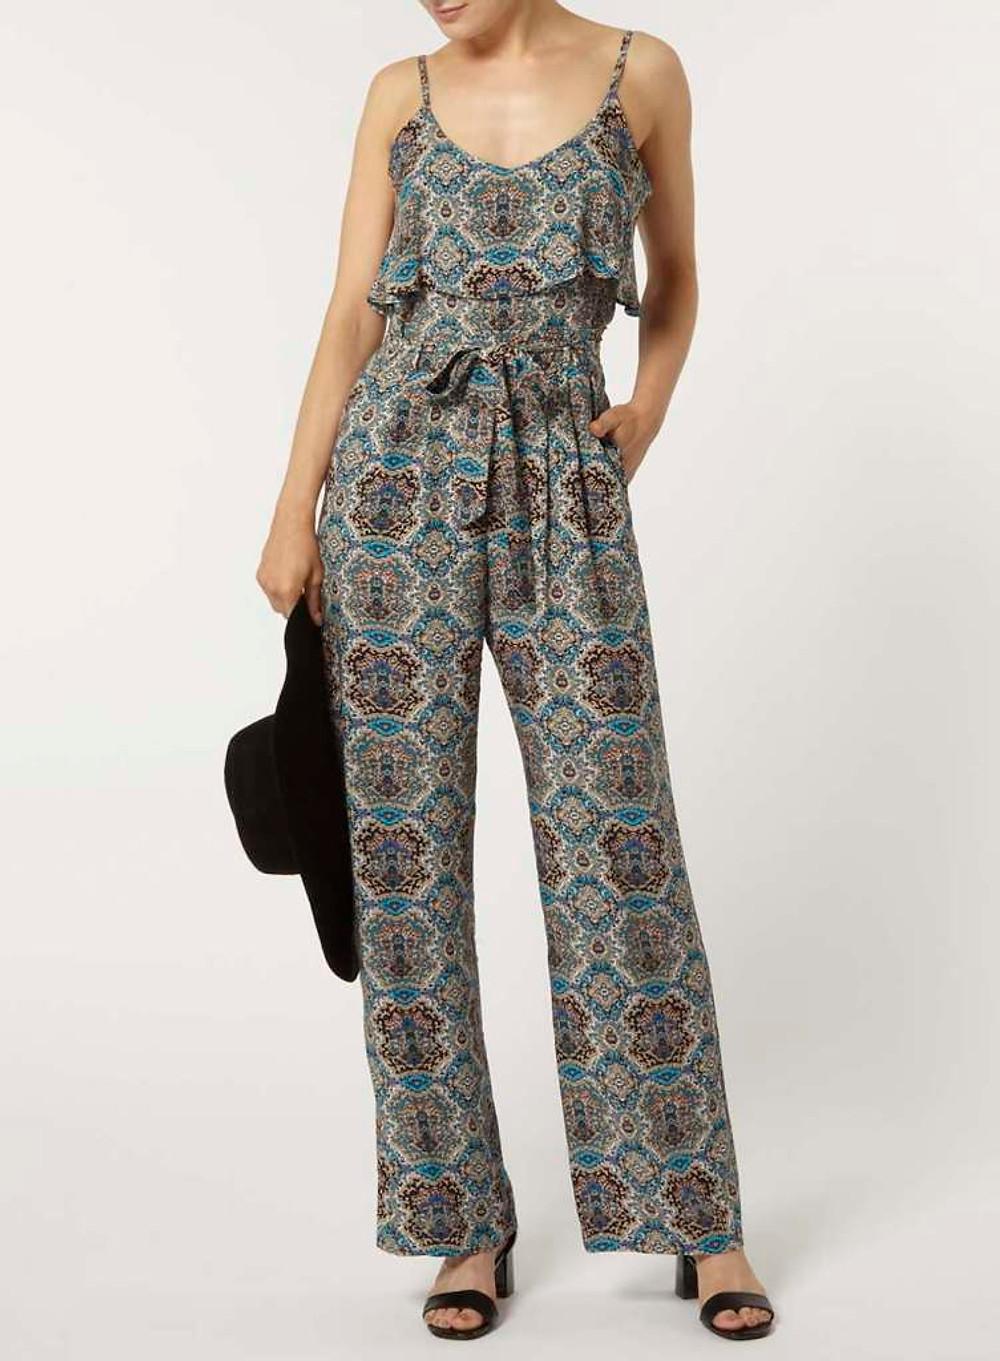 Dorothy Perkins - Combi-pantalon bleue à volants 20€